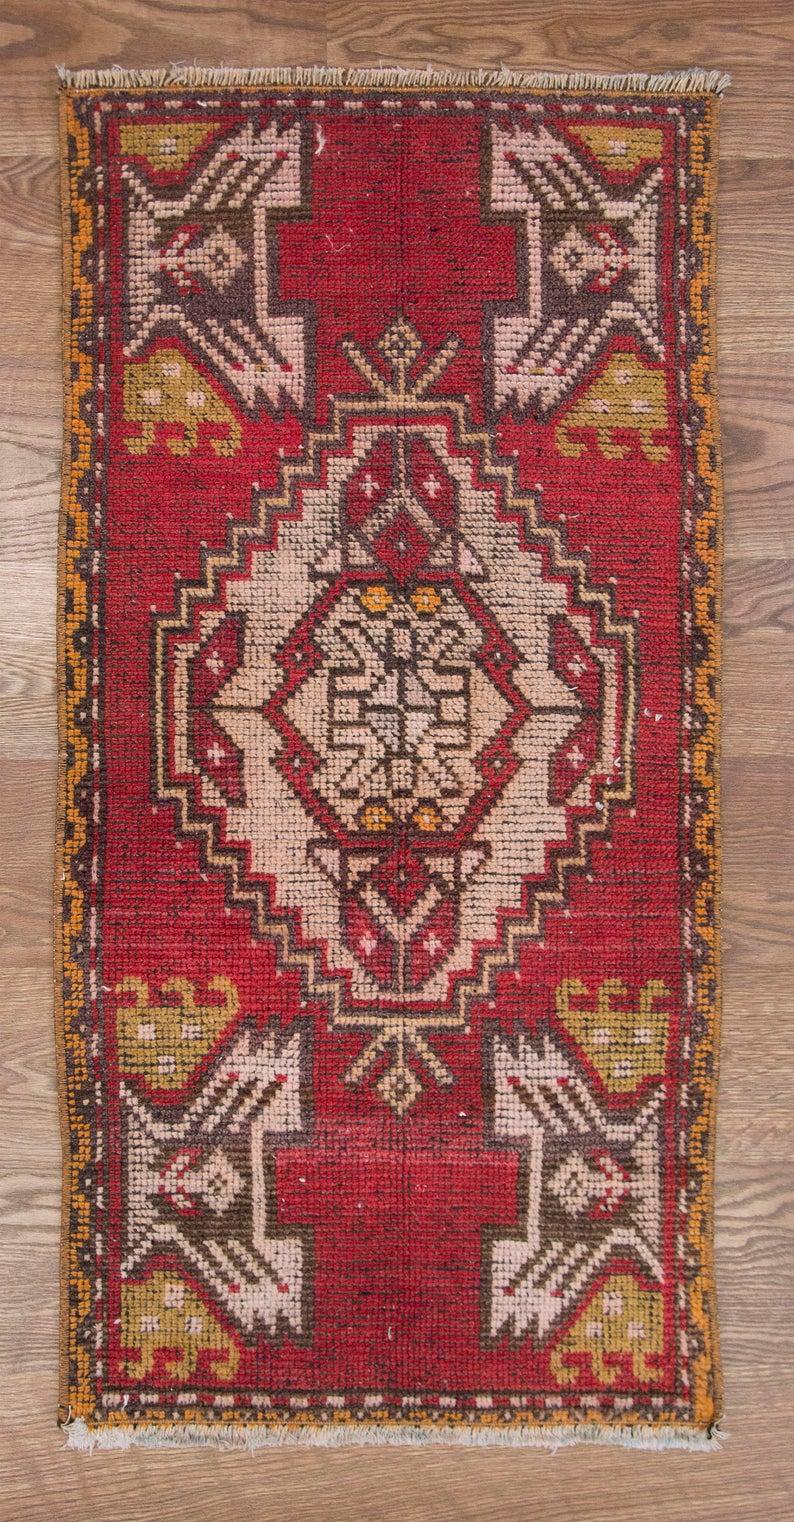 Free Shipping Gorgeous Door Mat Rugs Are On Sale 1 8 X 3 3 Feet Door Mat Rugs Vintage Turkish Door Mat Rug 50 X 99 Cm Door Mat Rug In 2020 Antique